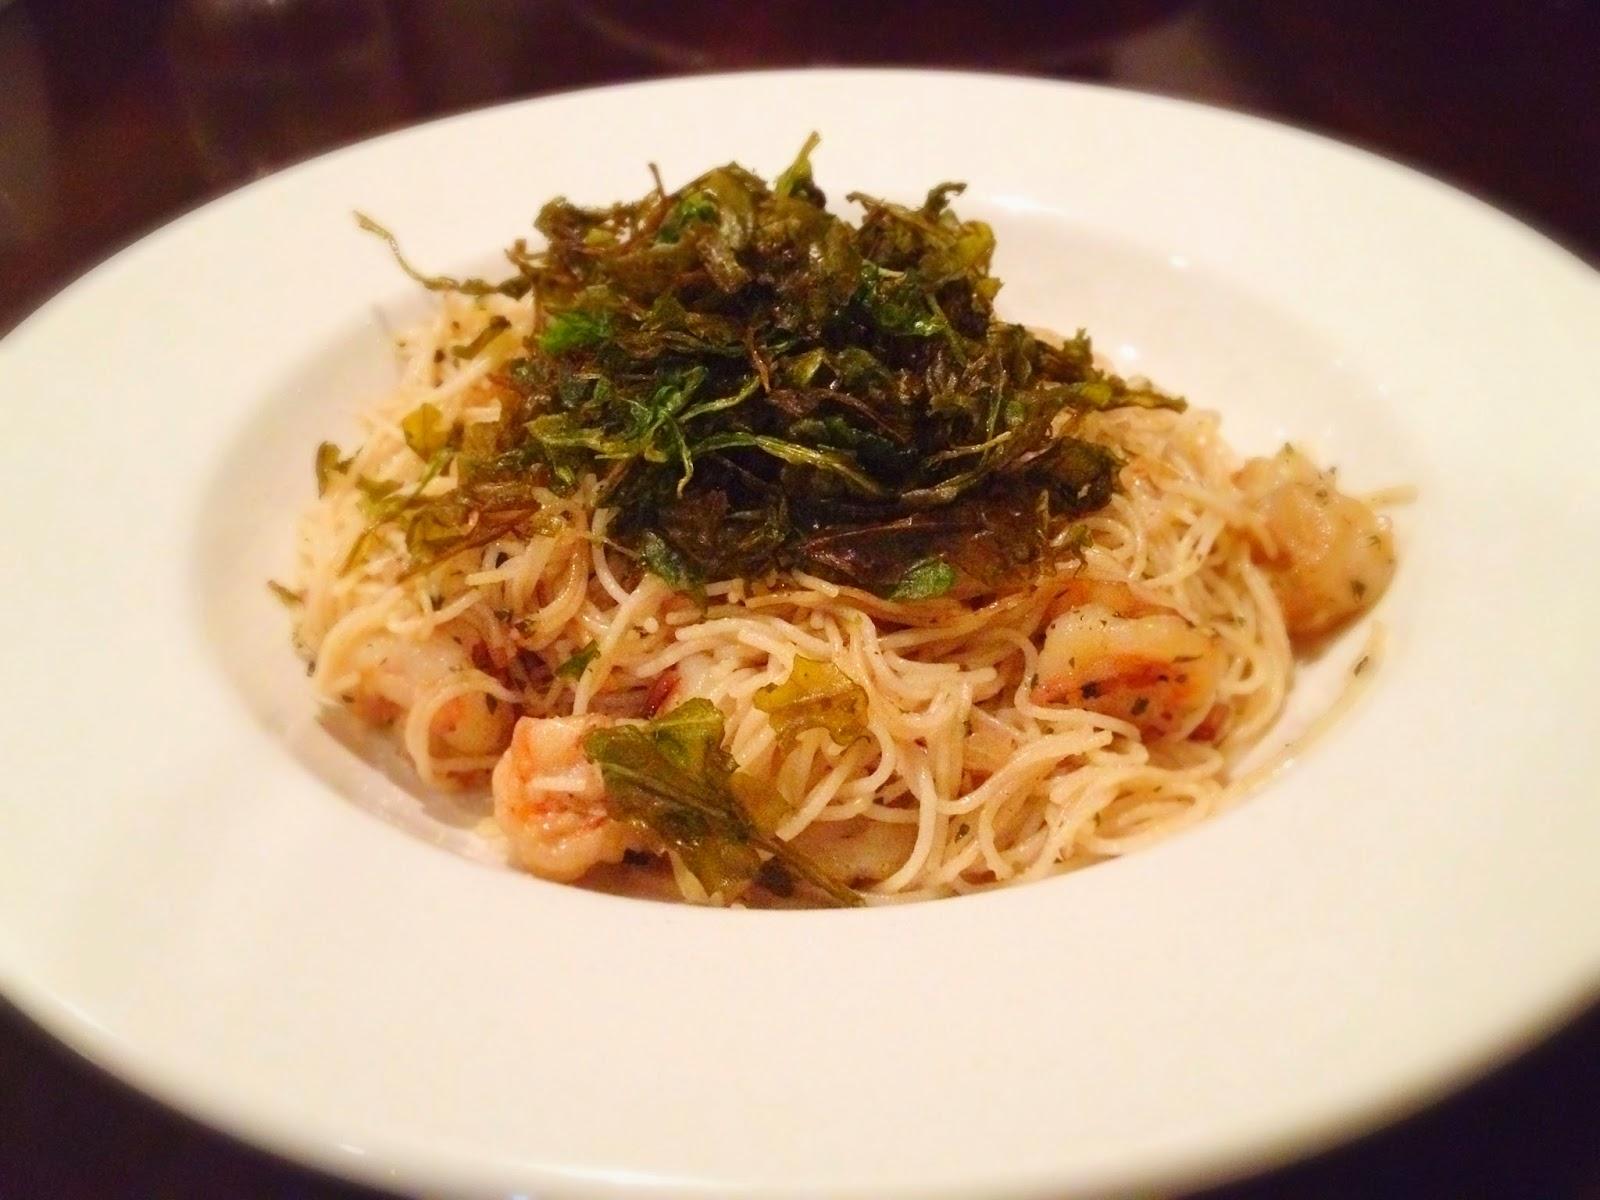 angel hair pasta tiger prawns cointreau fried rocket